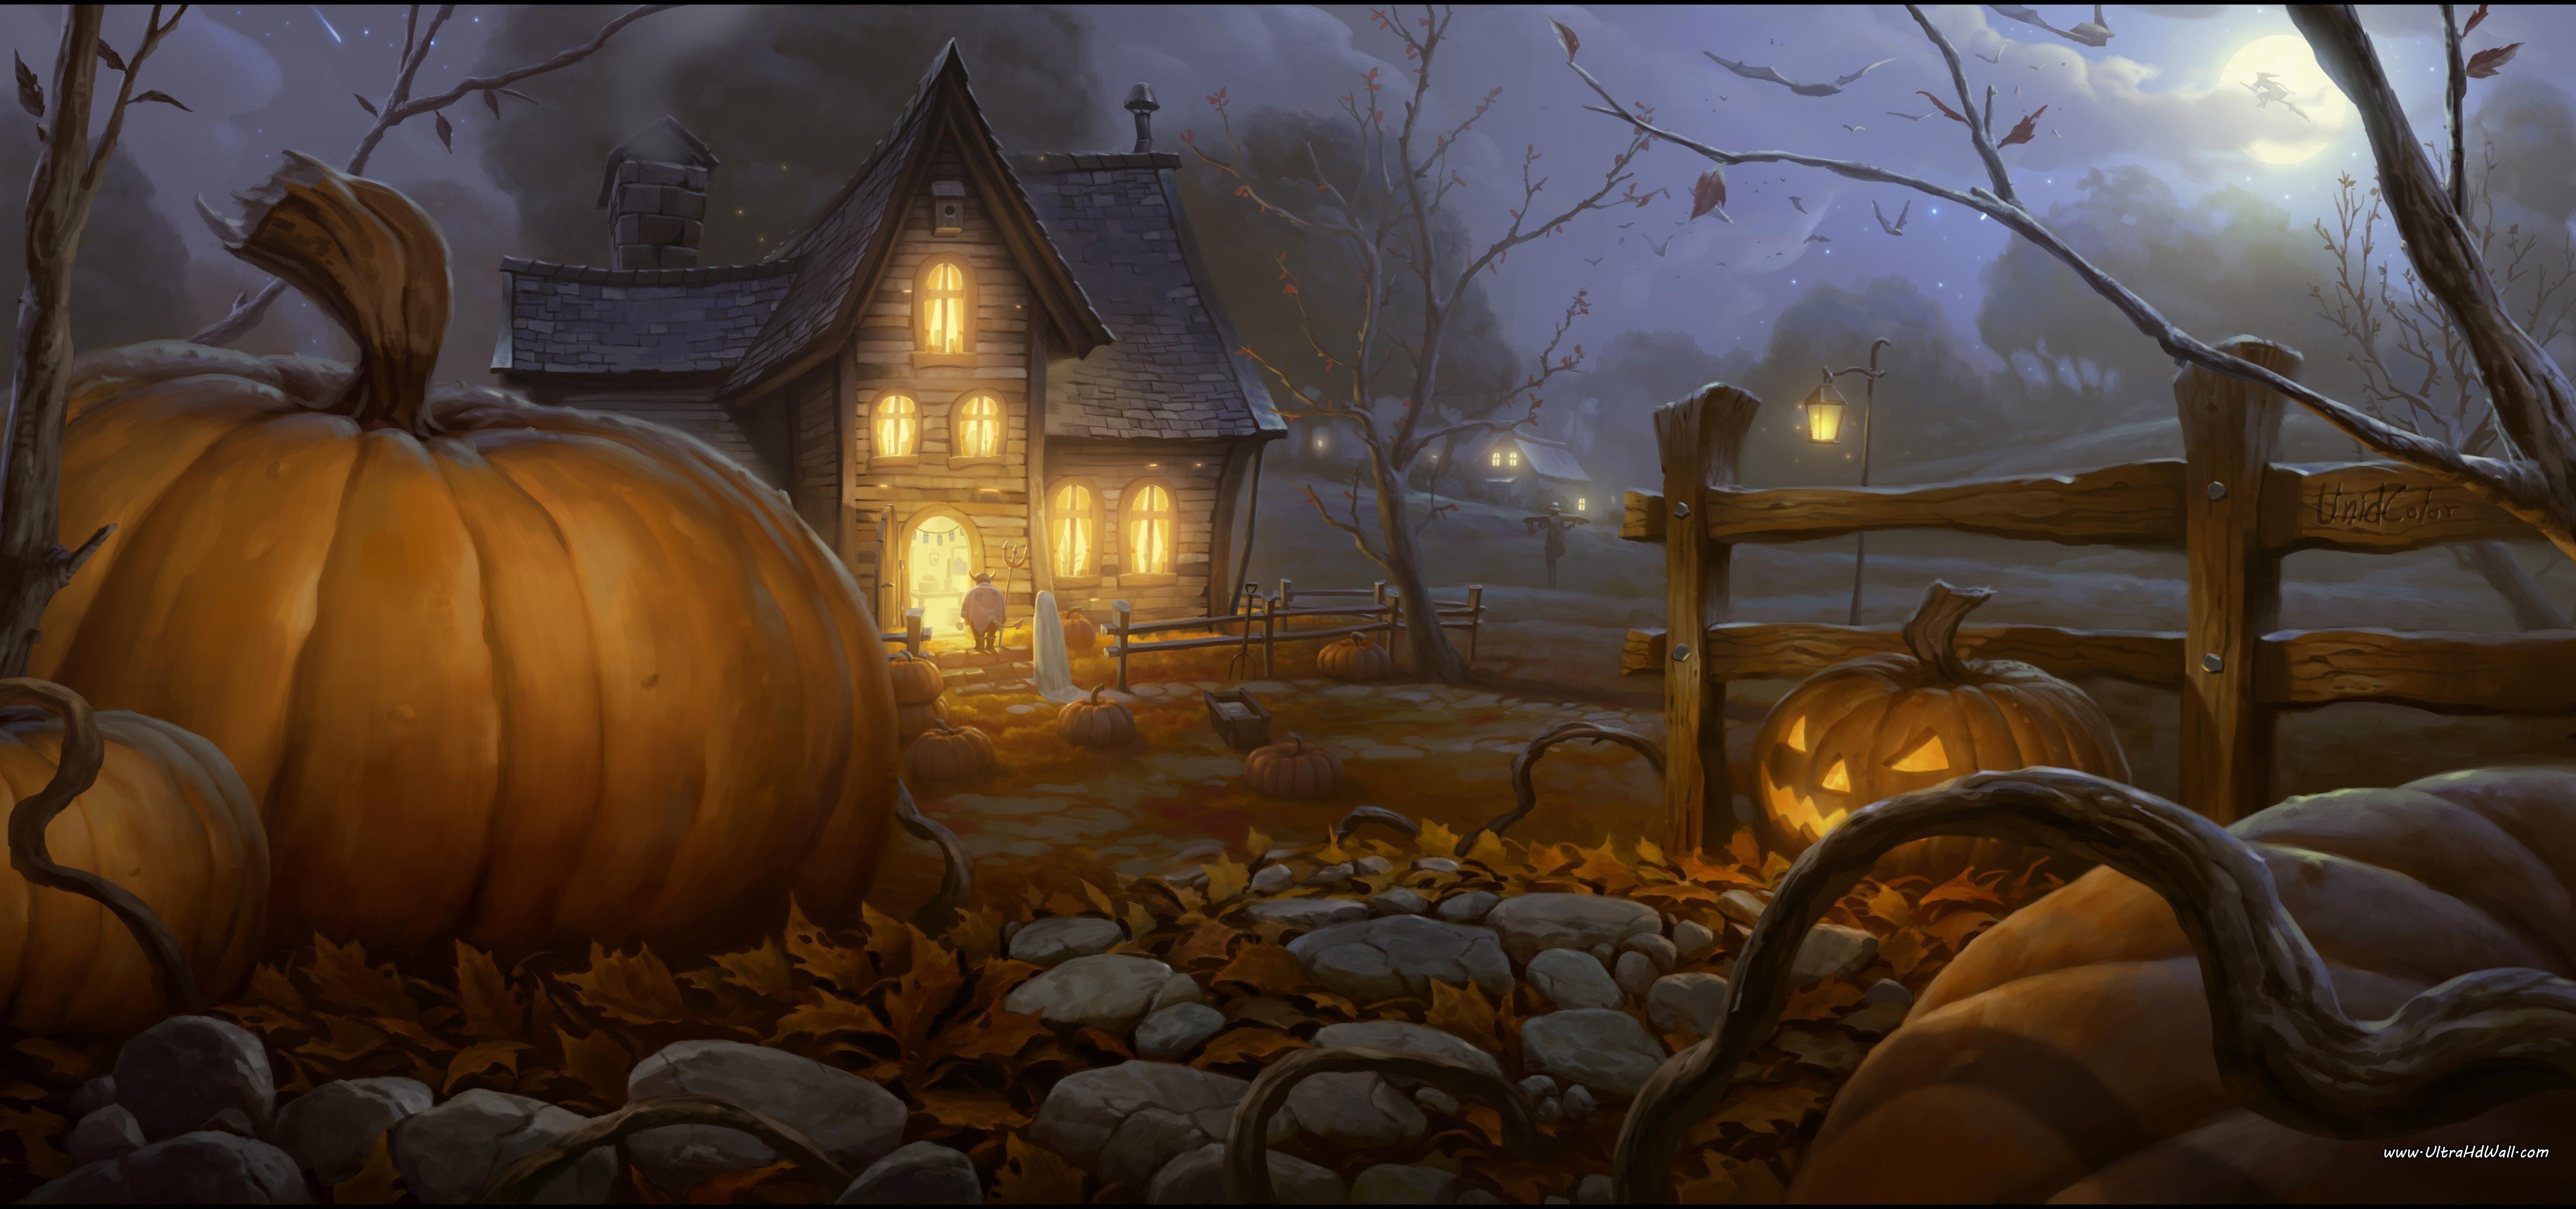 http://iwantimage.com/ax/halloween-desktop-background.html ...